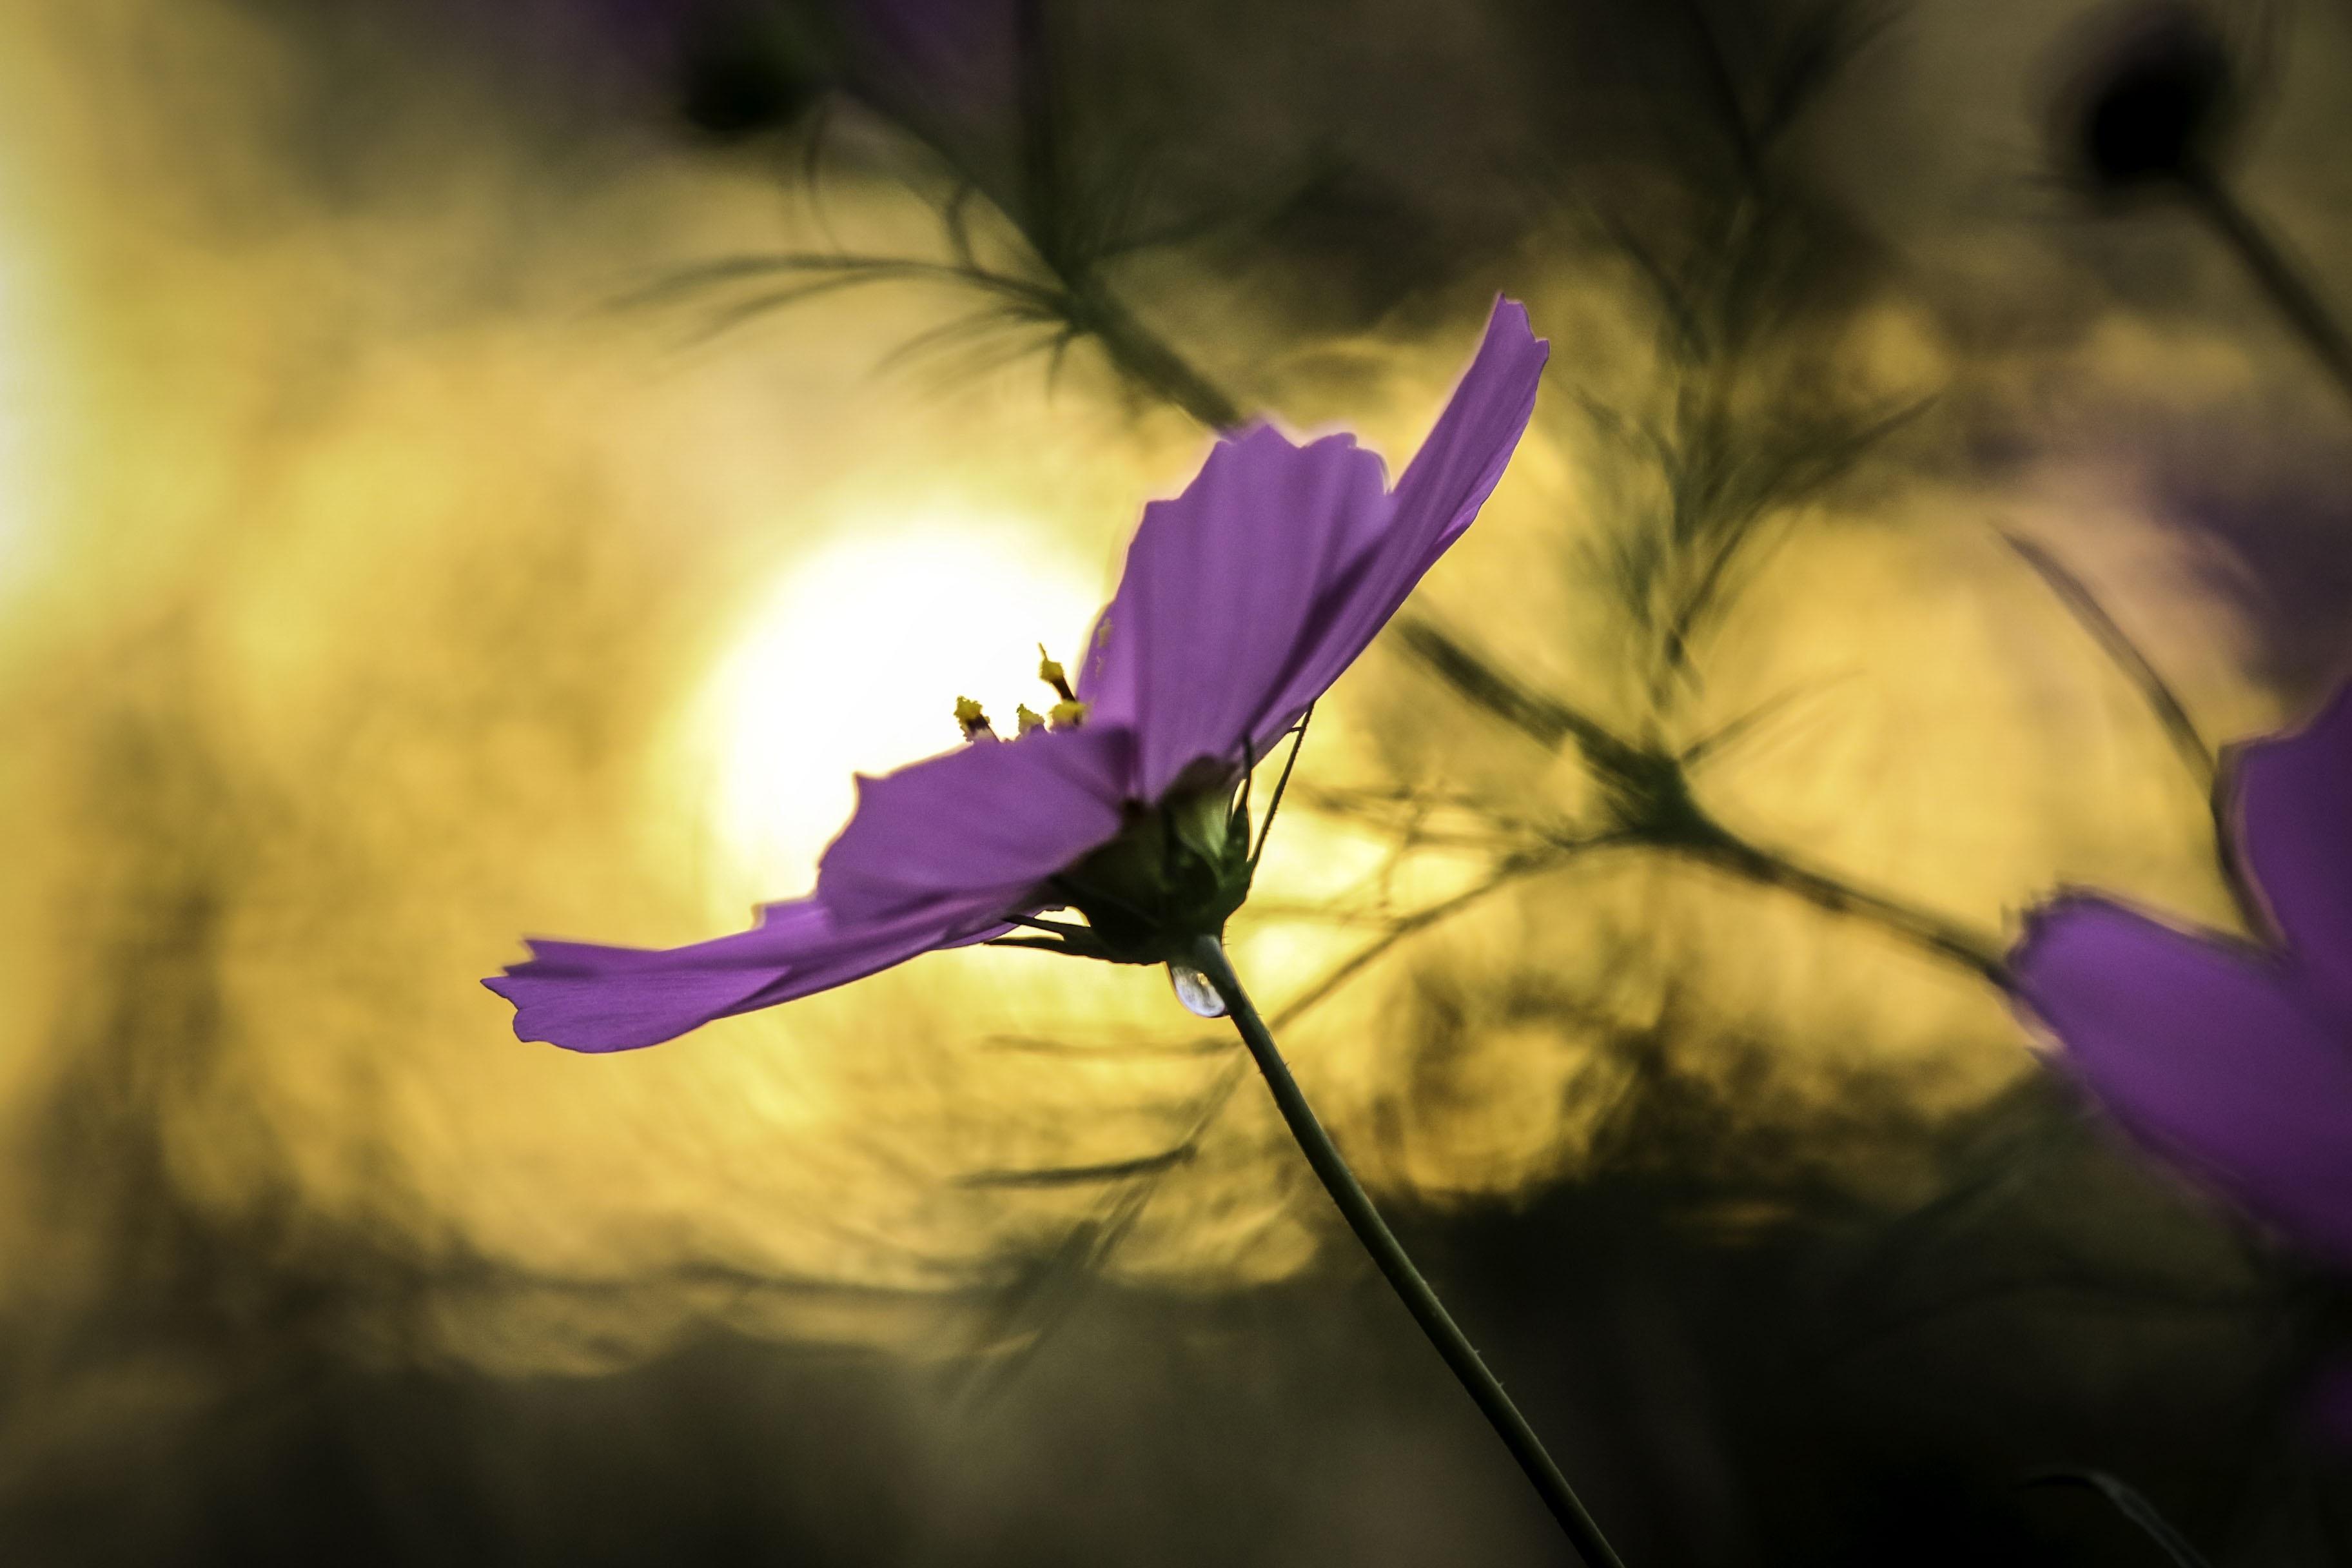 Fotos Gratis Naturaleza Flor Planta Cielo Fotografia Luz De